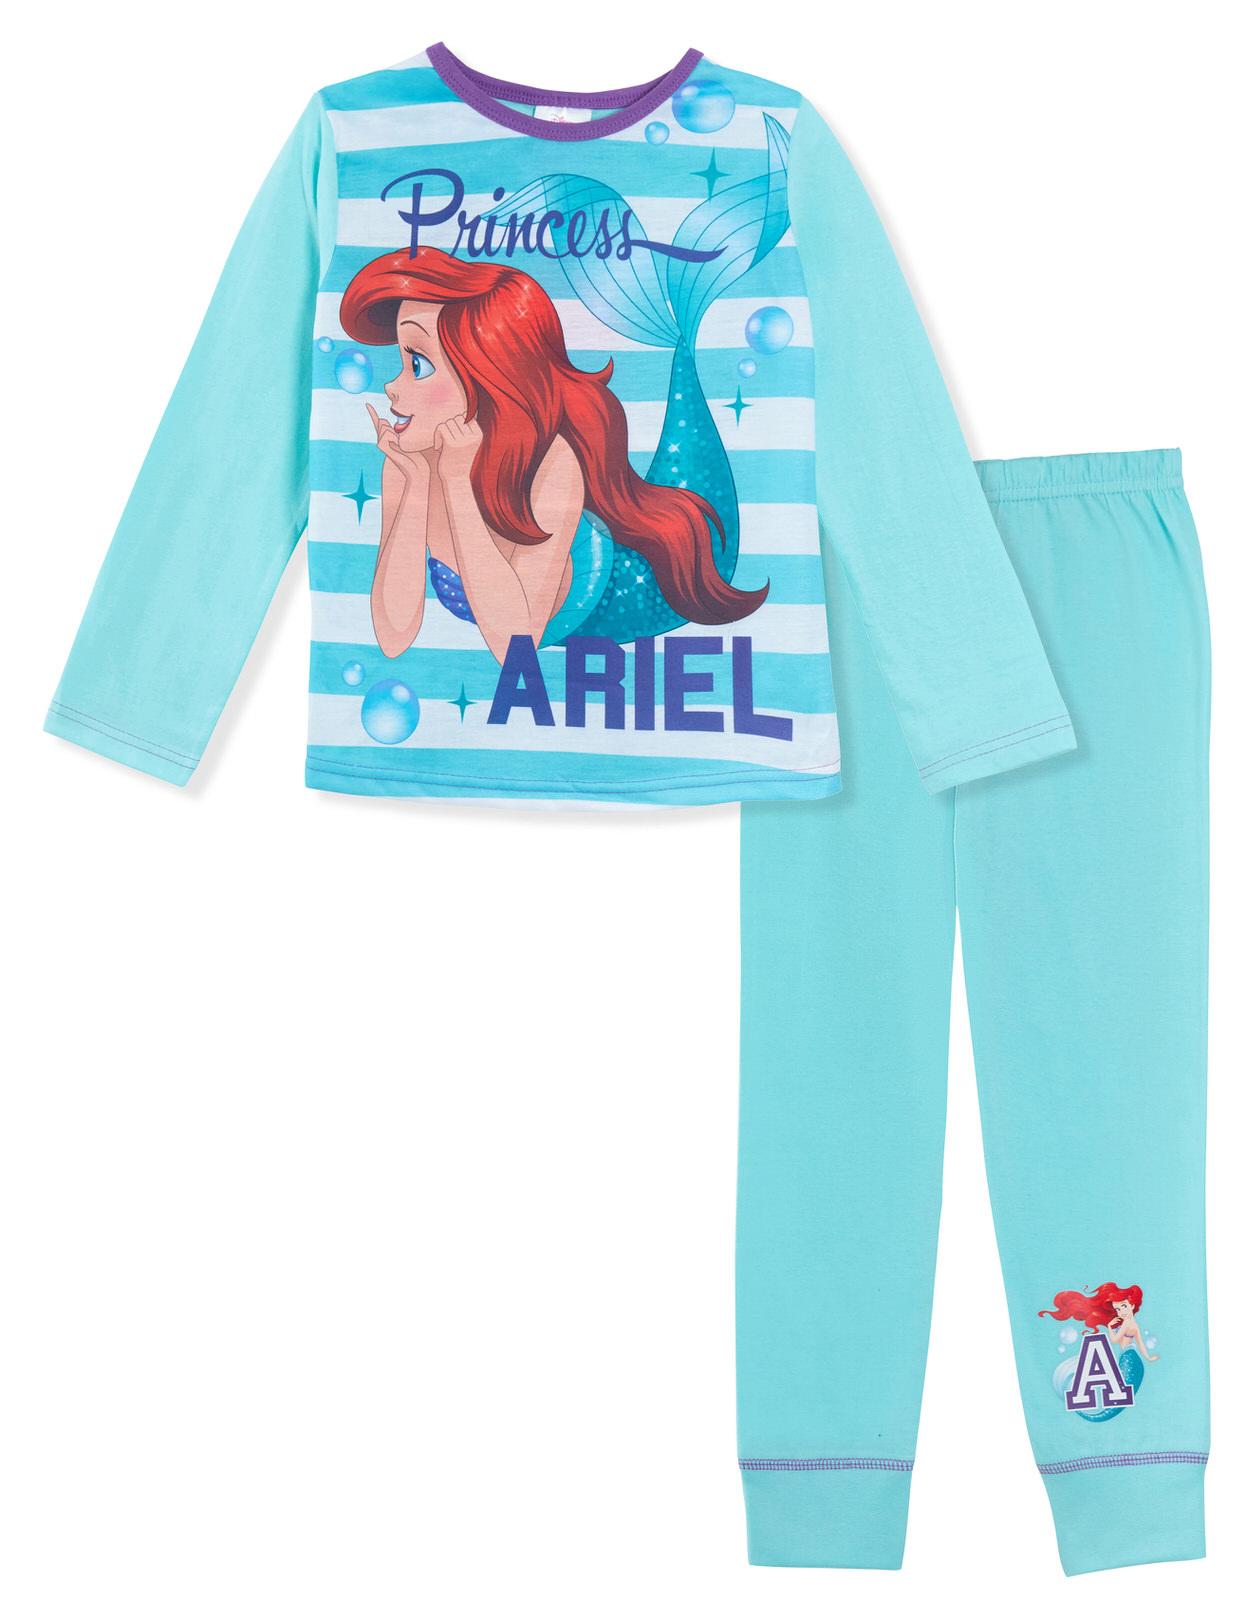 Girls Disney Princess Long Pyjamas Pj/'s Set 2 Piece Cinderella Belle Ariel Size